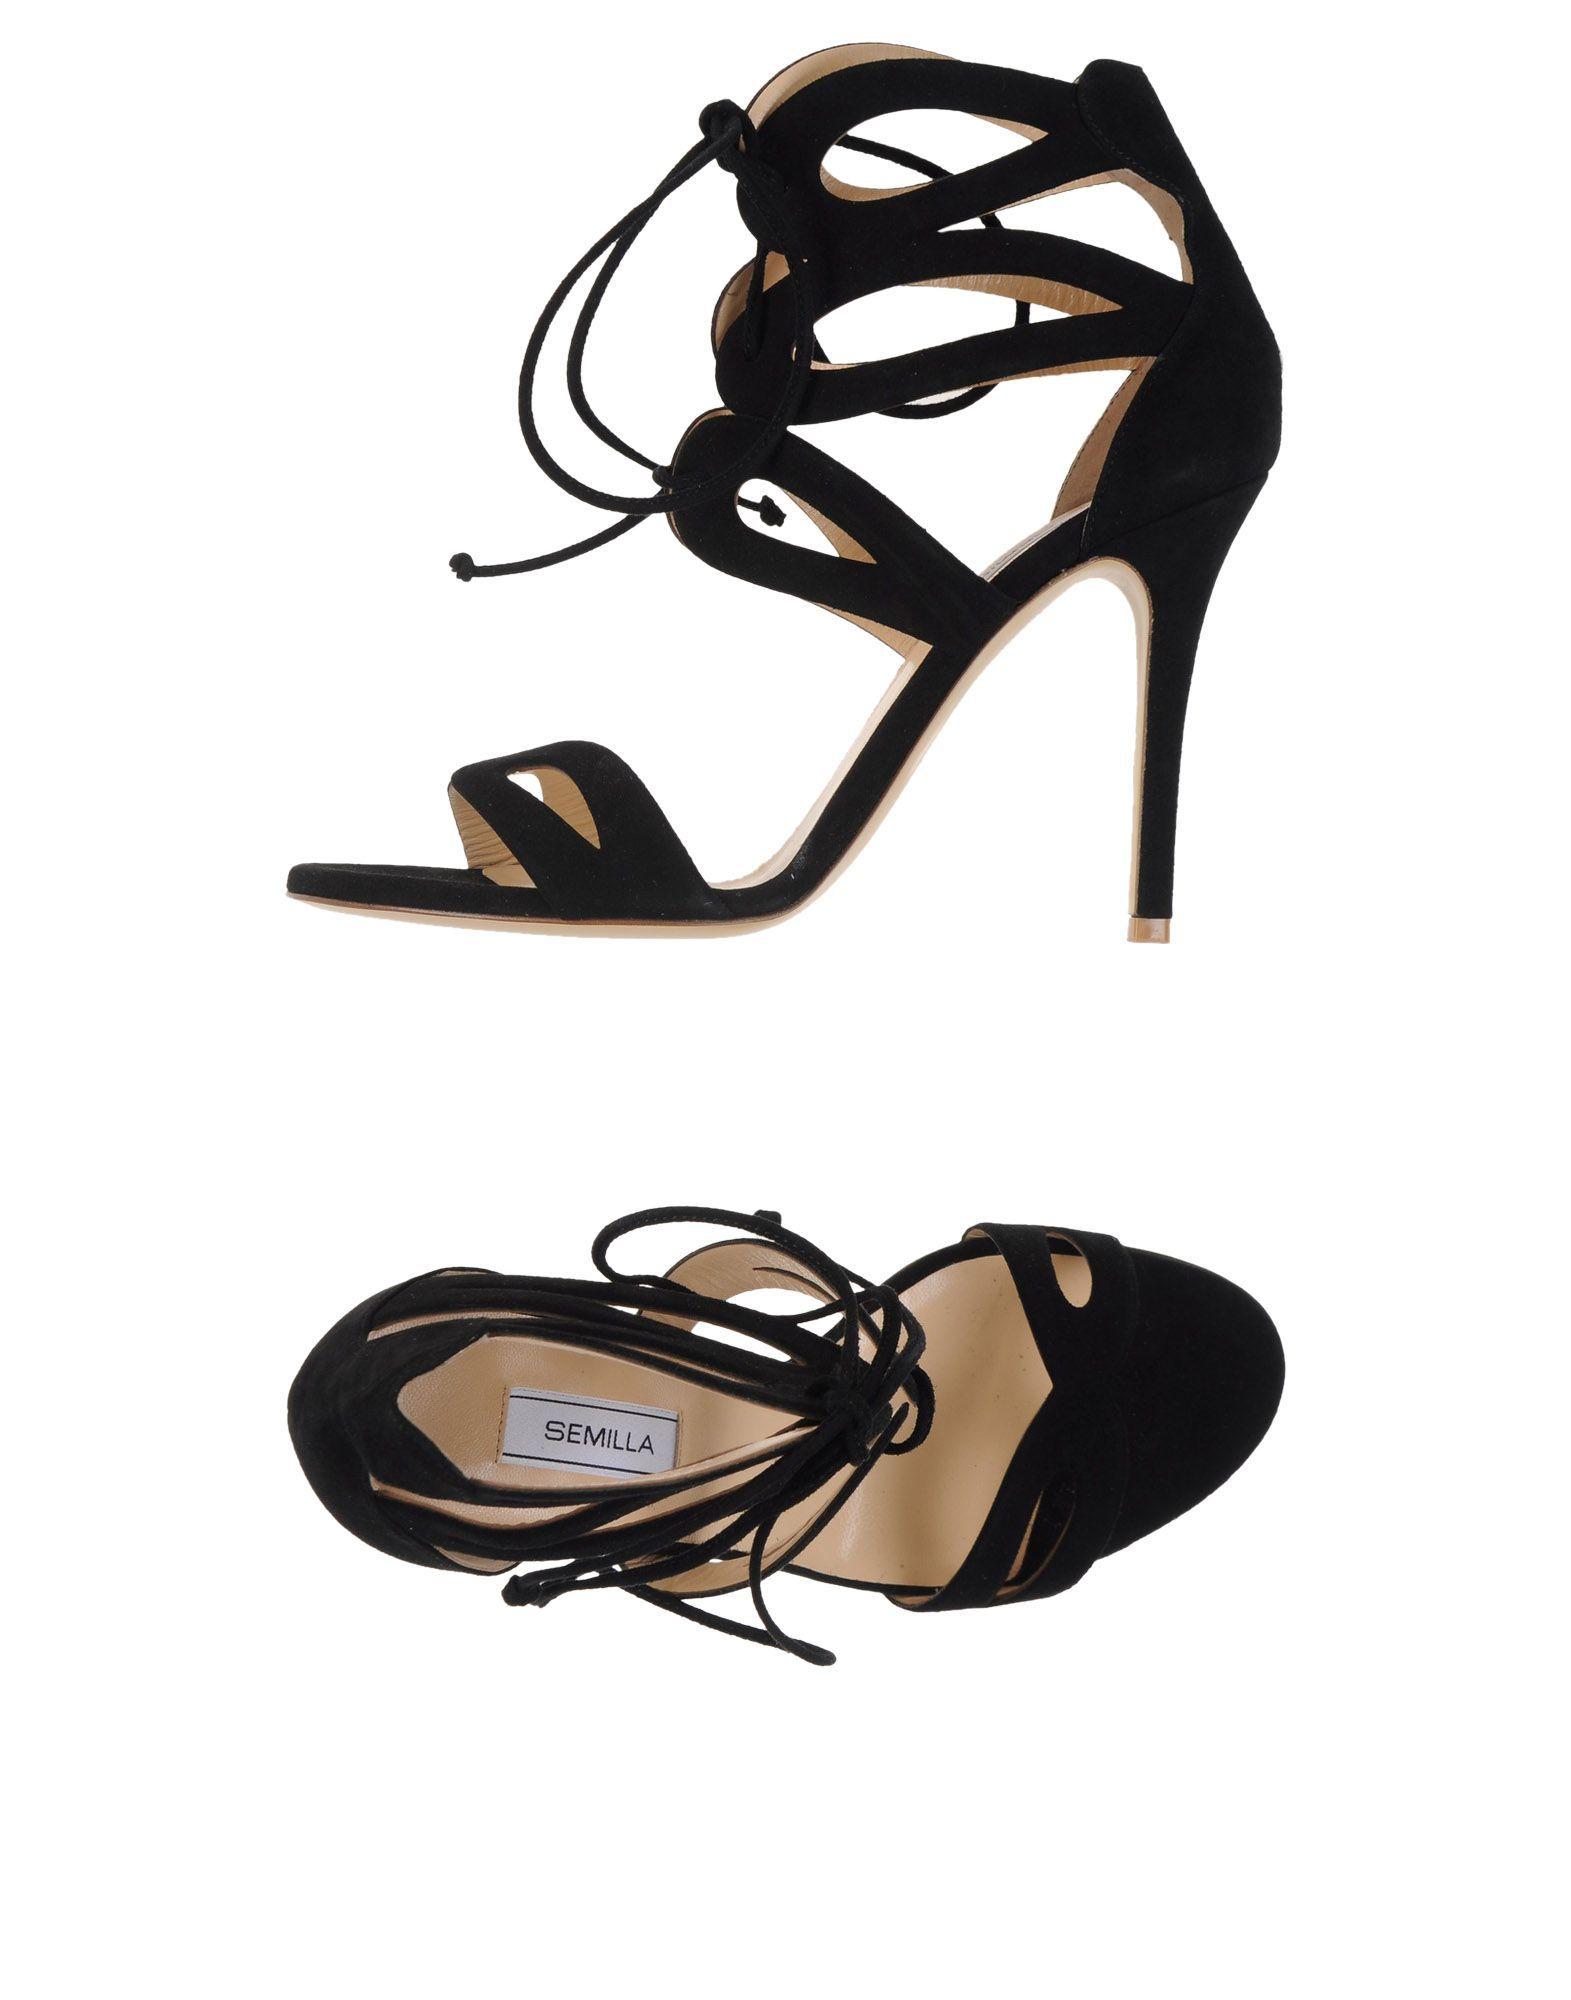 FOOTWEAR - Sandals Semilla Pick A Best Limited Edition Sale Online Under 50 Dollars Marketable For Sale znOYk9U